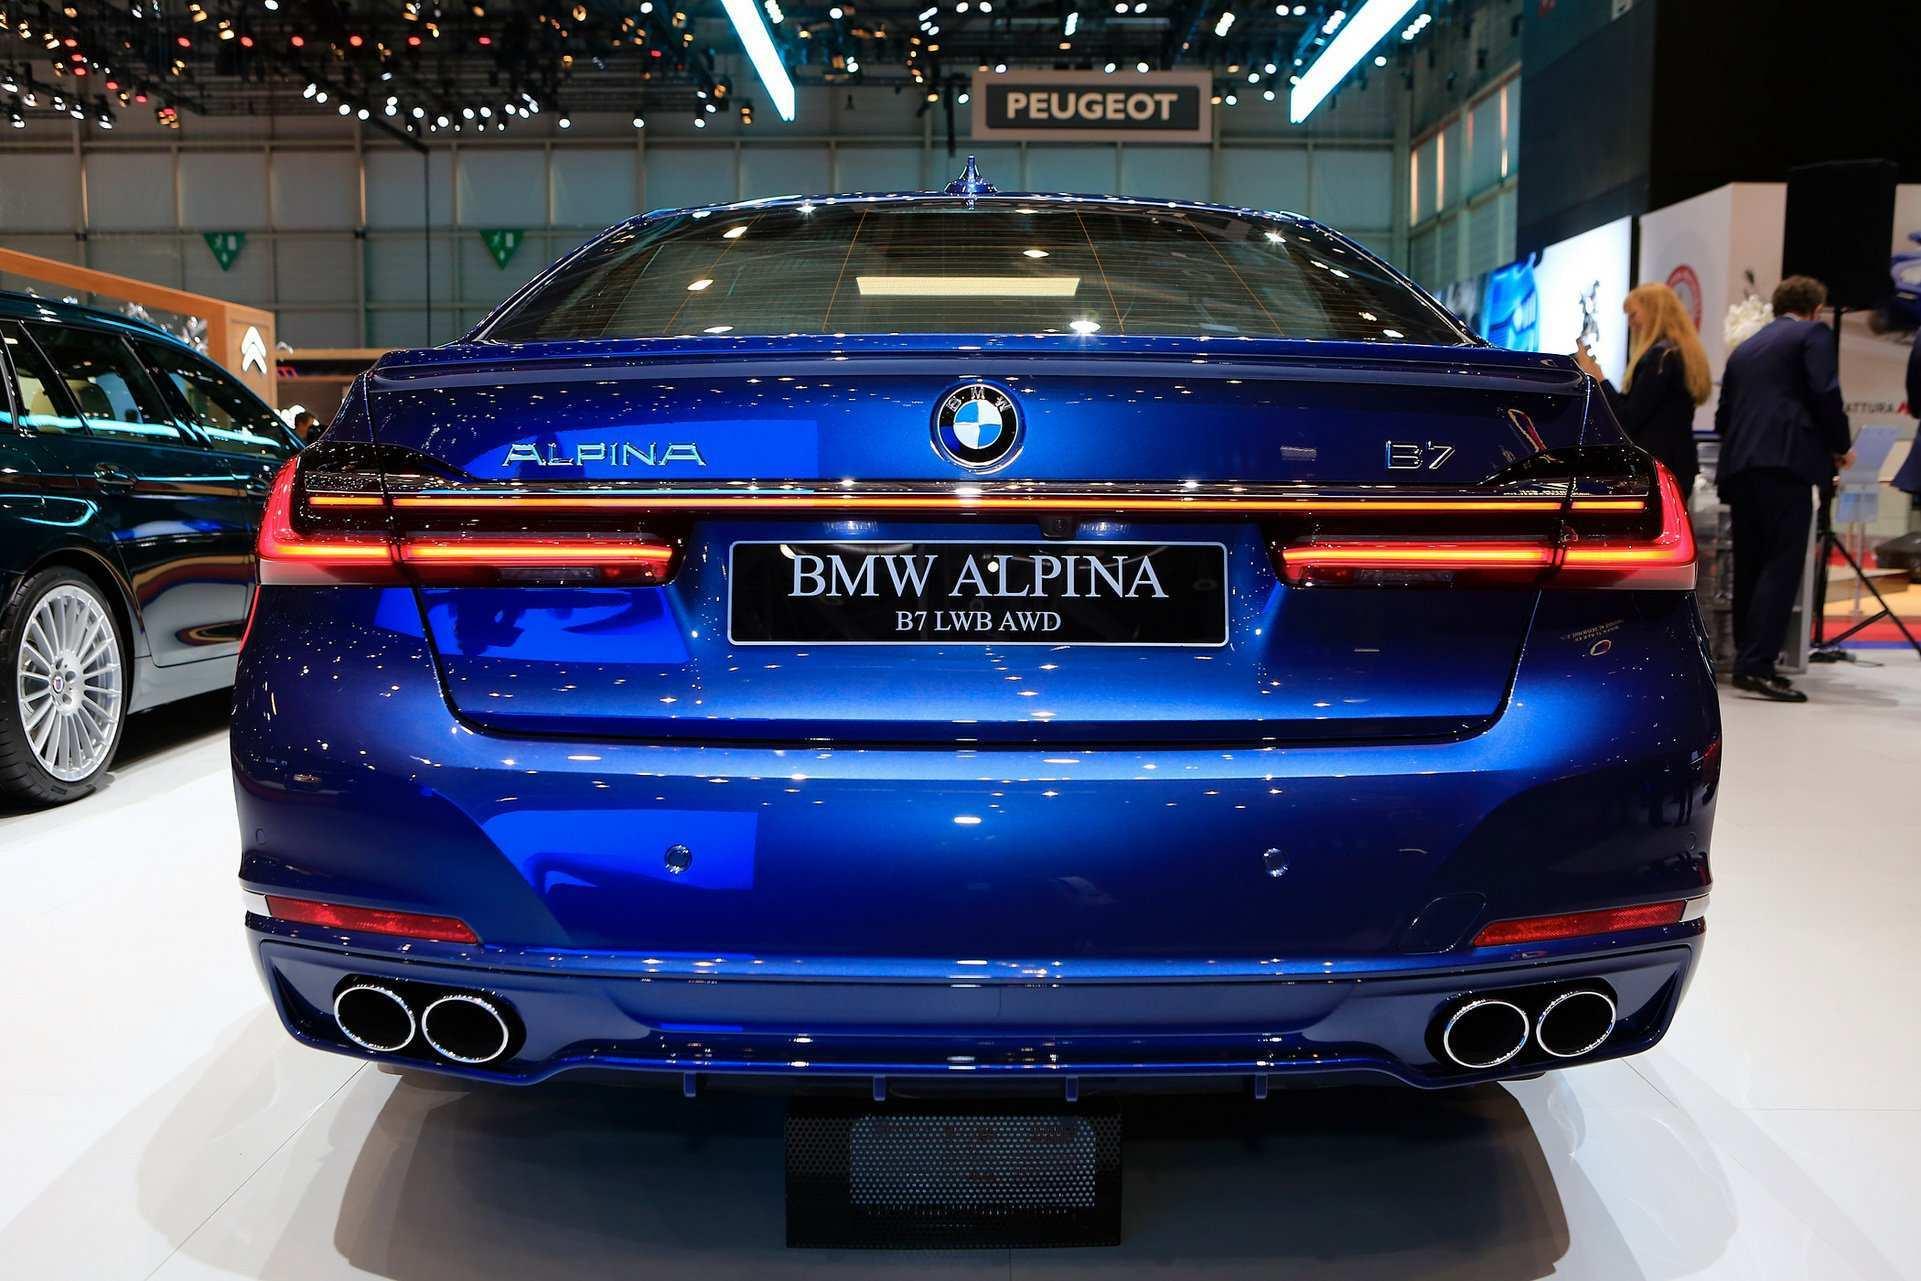 46 New BMW Alpina B7 2020 Price Price and Review by BMW Alpina B7 2020 Price